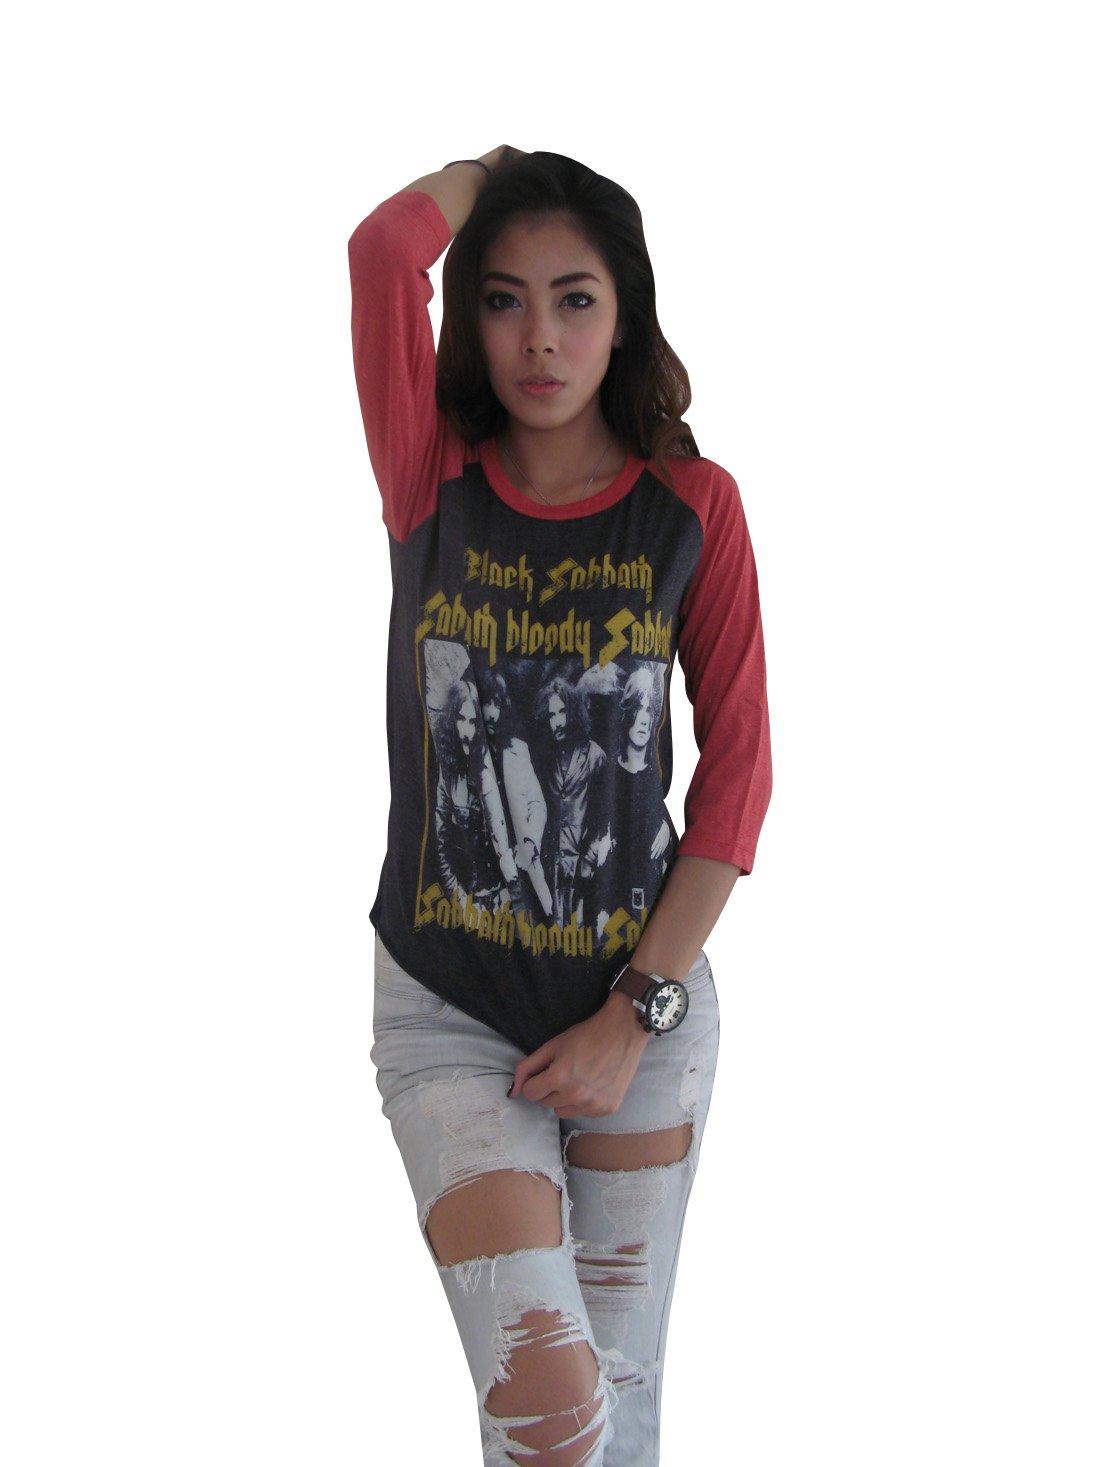 Bunny Brand Women's Black Sabbath Bloody Sabbath Ozzy Osbourne Raglan T-Shirt (Large, Gray)